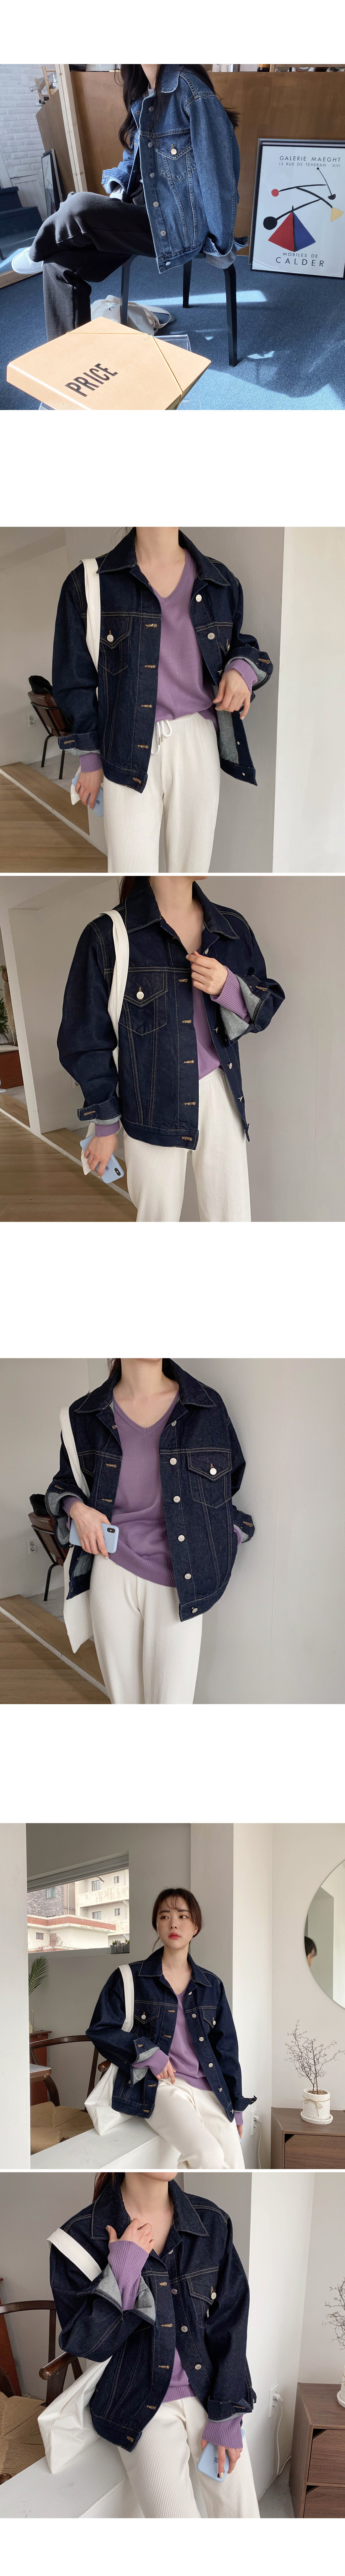 Lush Loose-fit Denim Jacket - Raw Dark Blue, Dark Blue